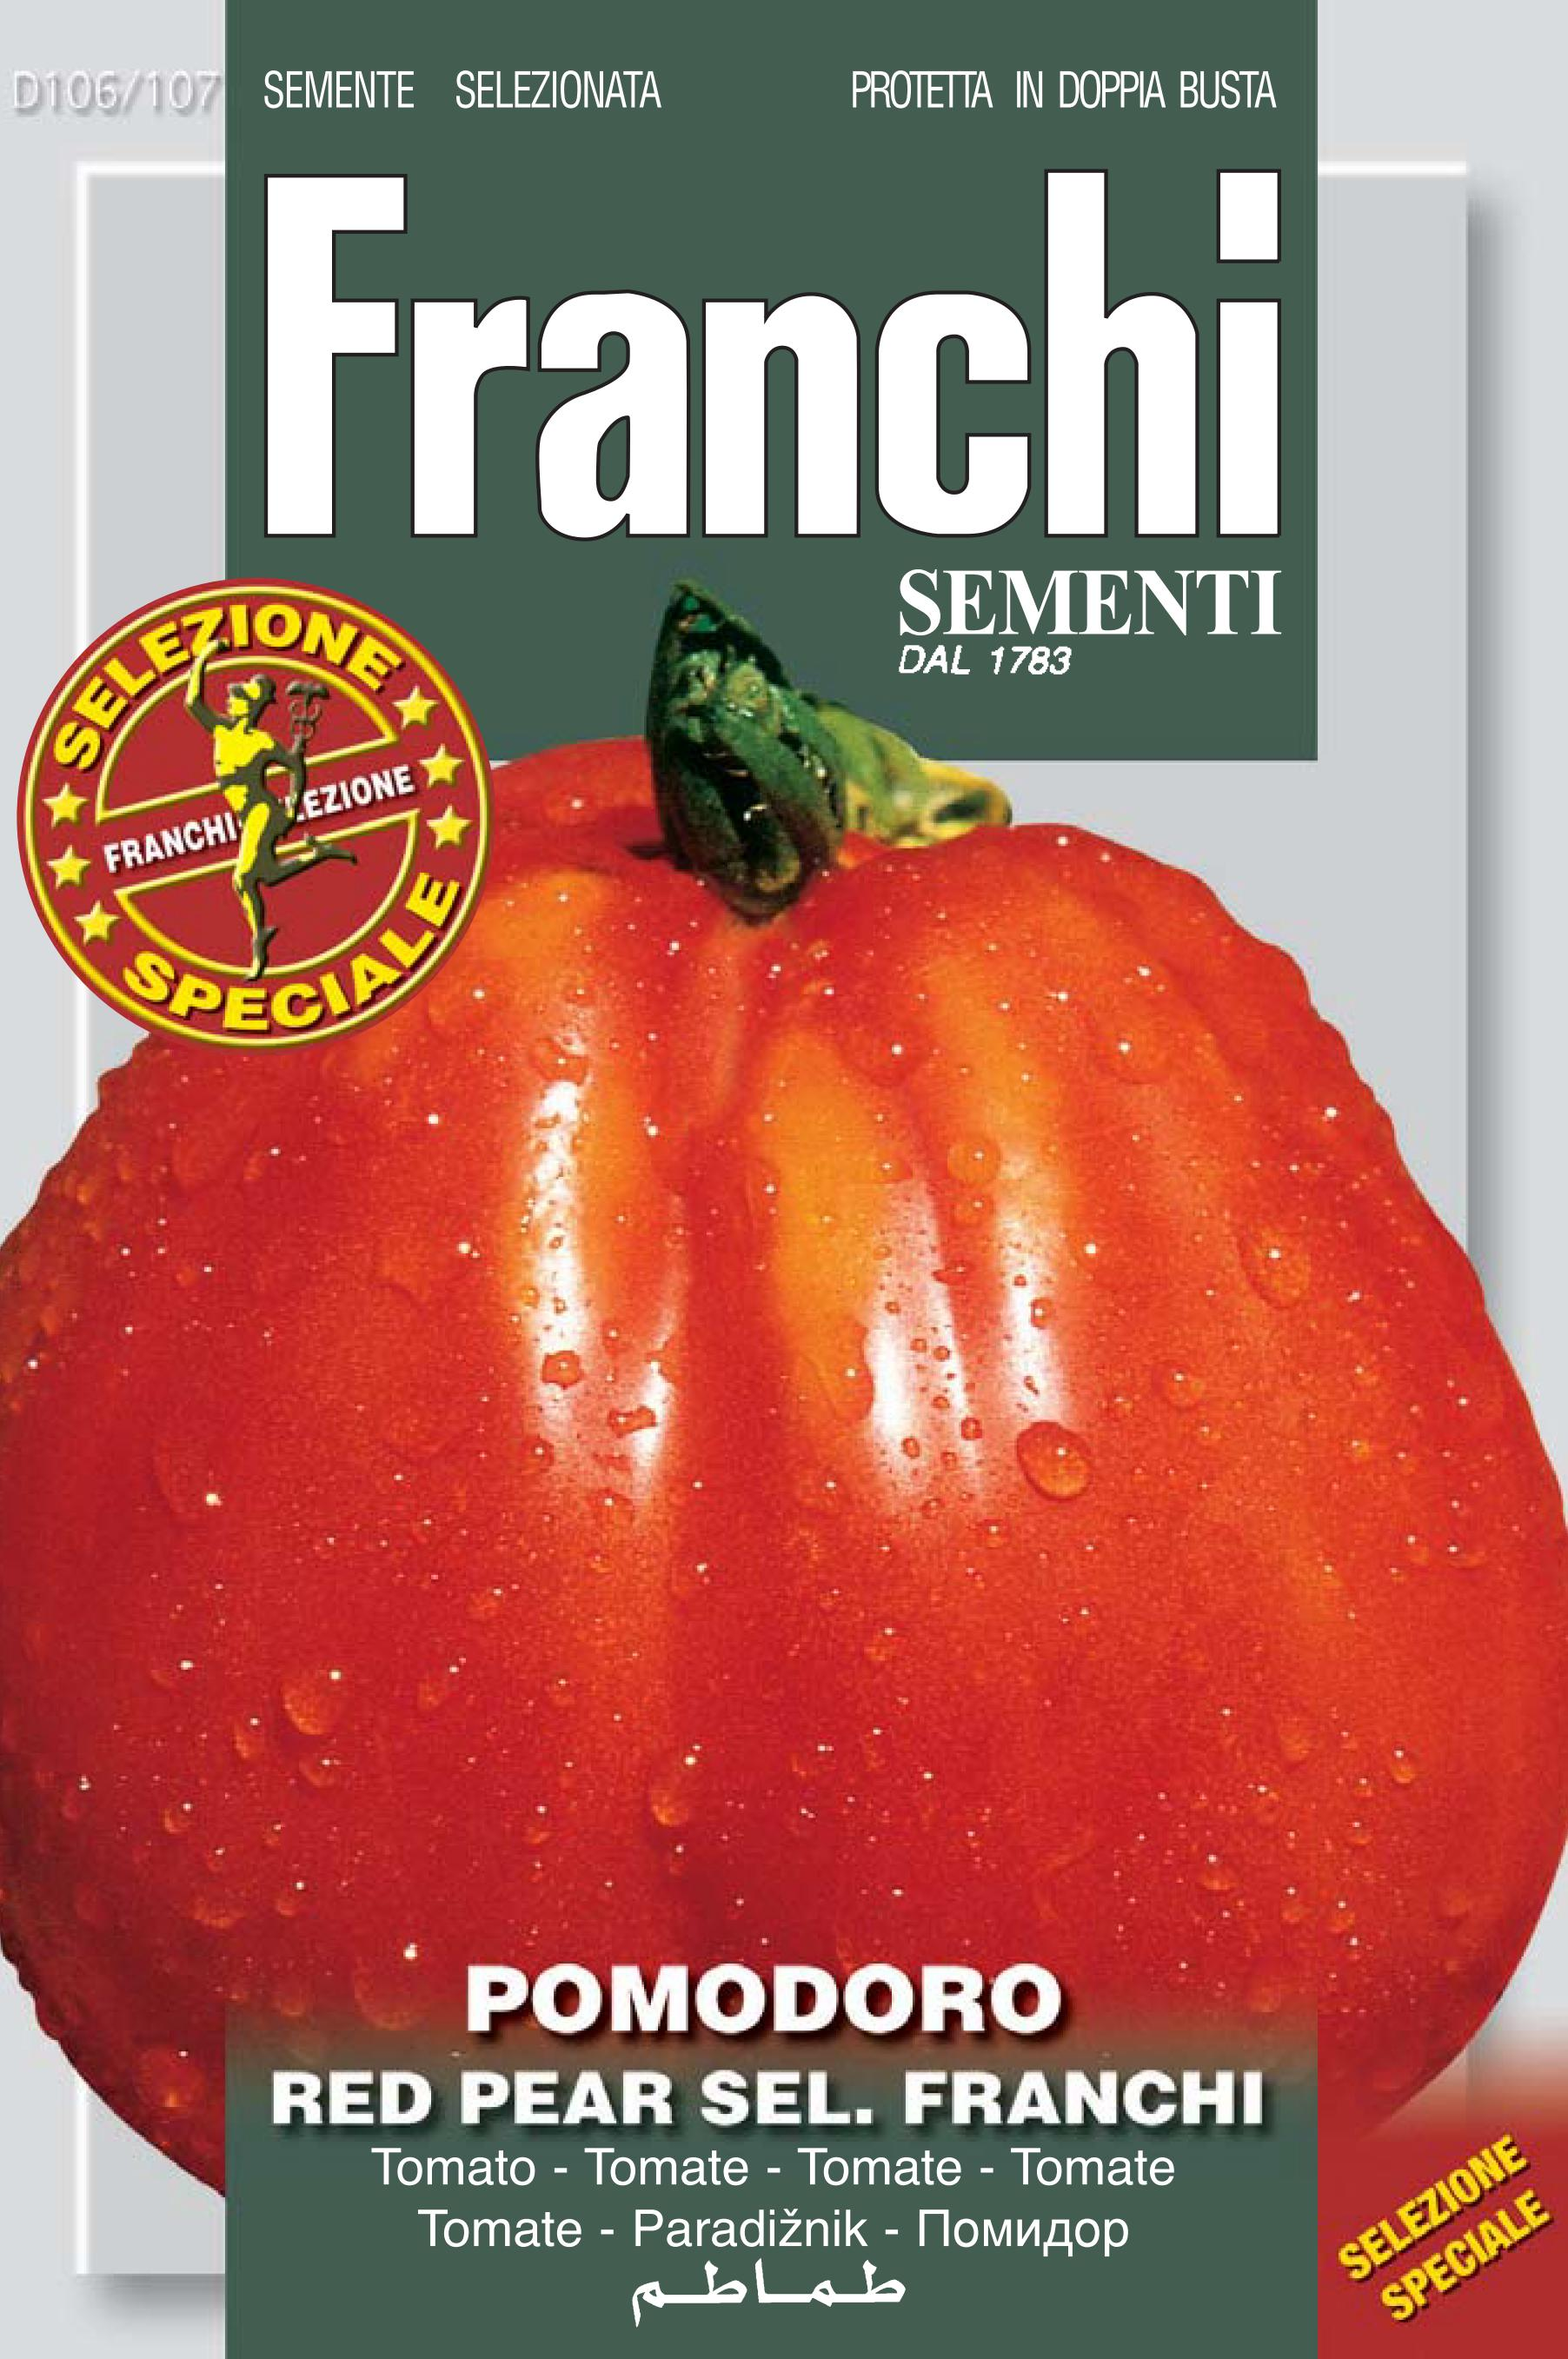 Tomato Red Pear Franchi Of Bergamo